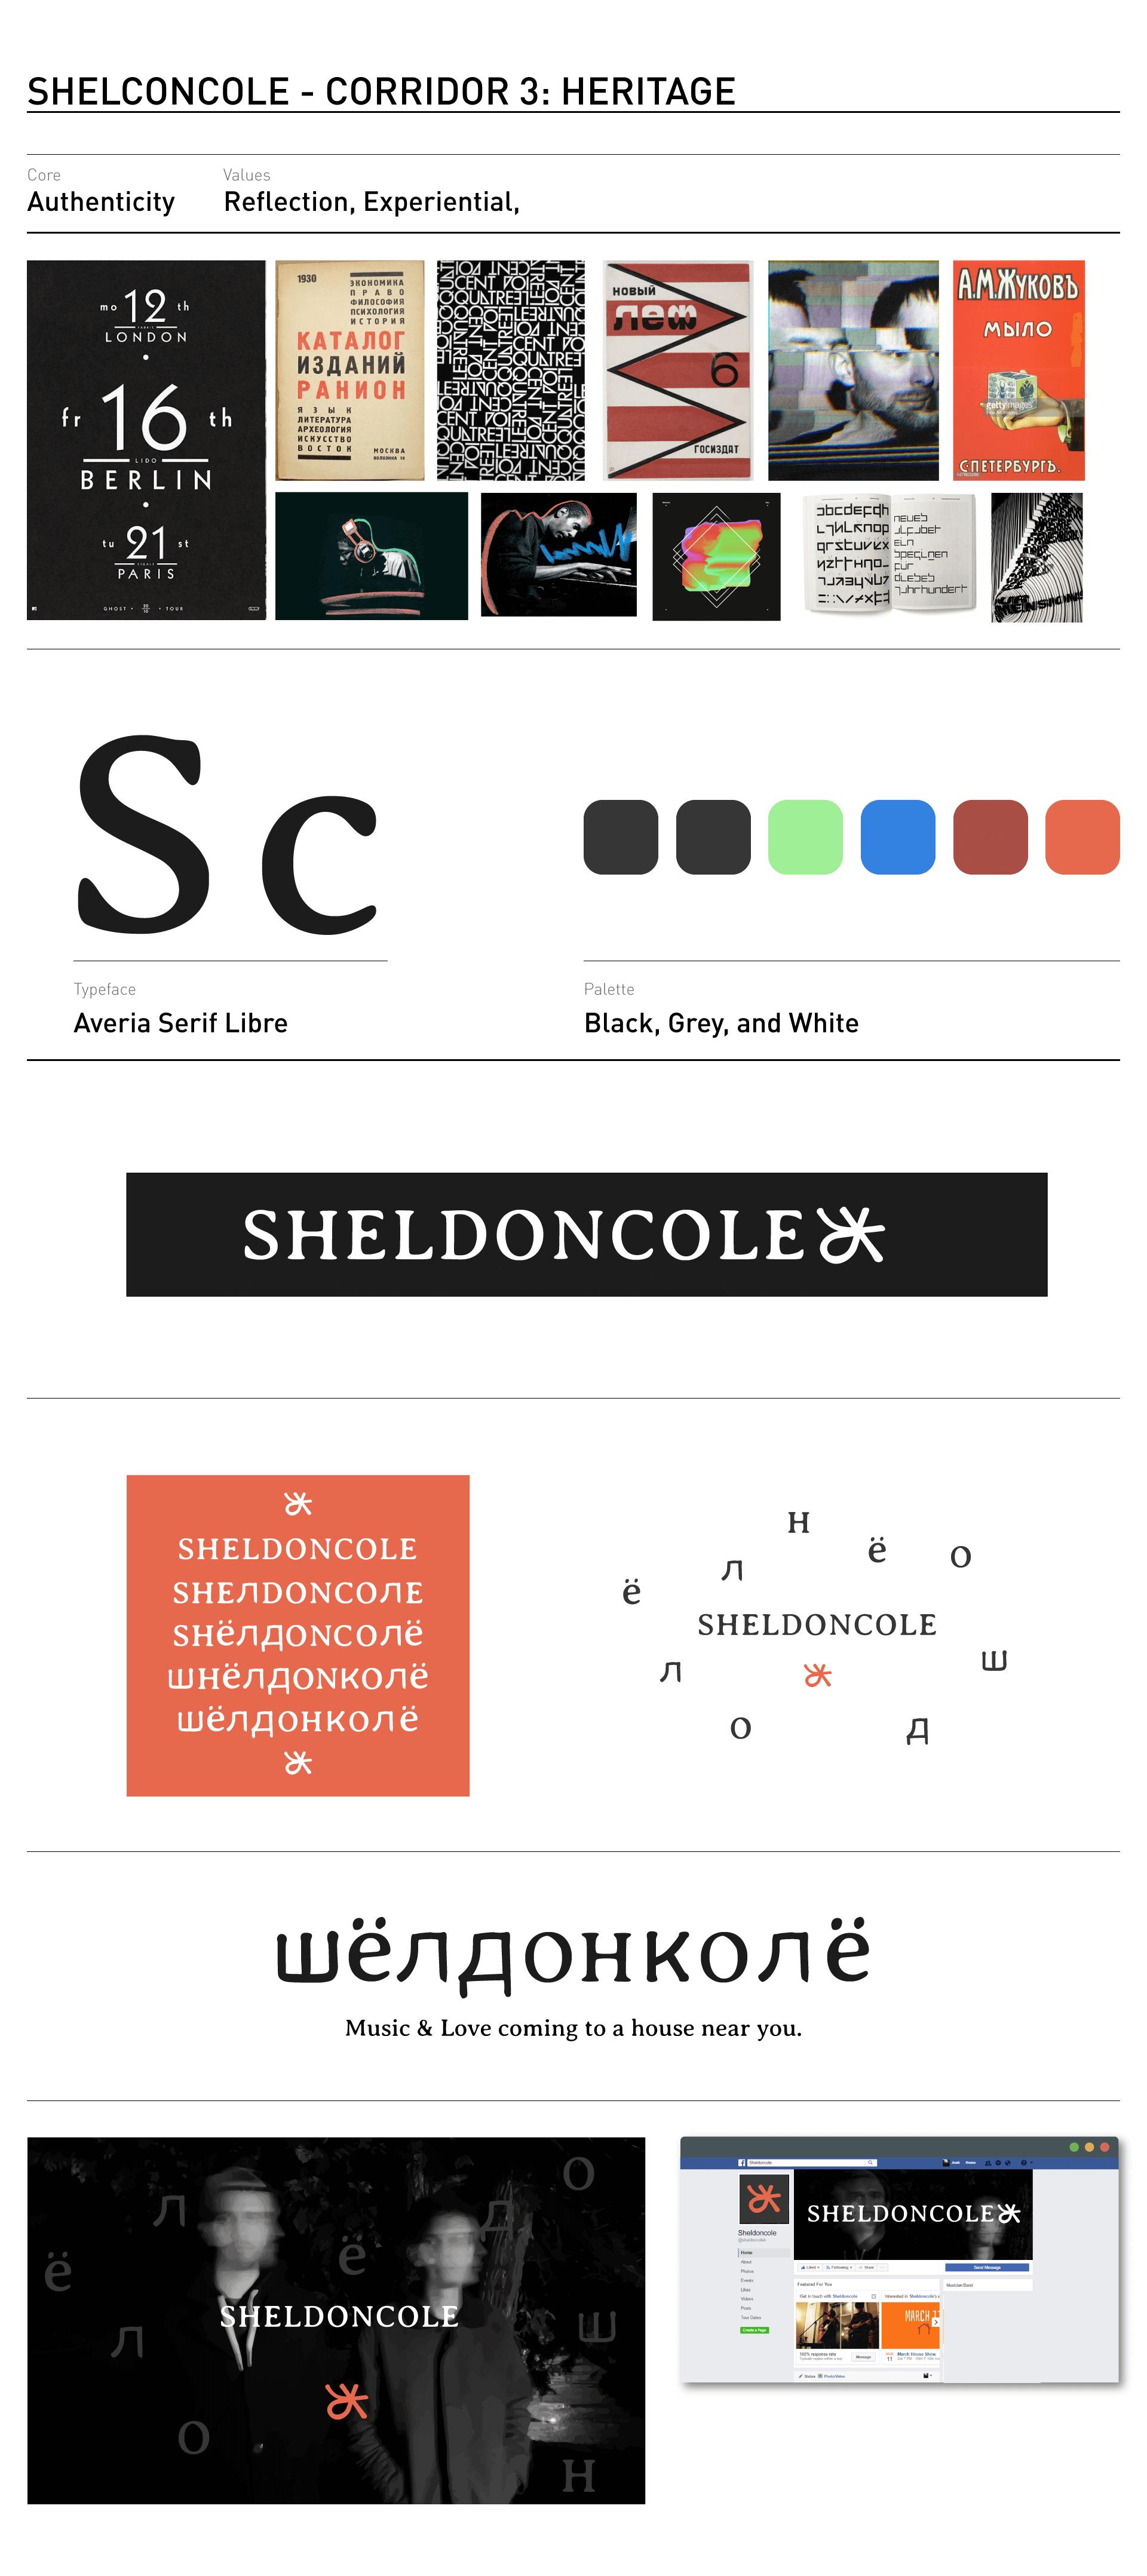 sheldoncole_corridorsC_heritage-tiny.png